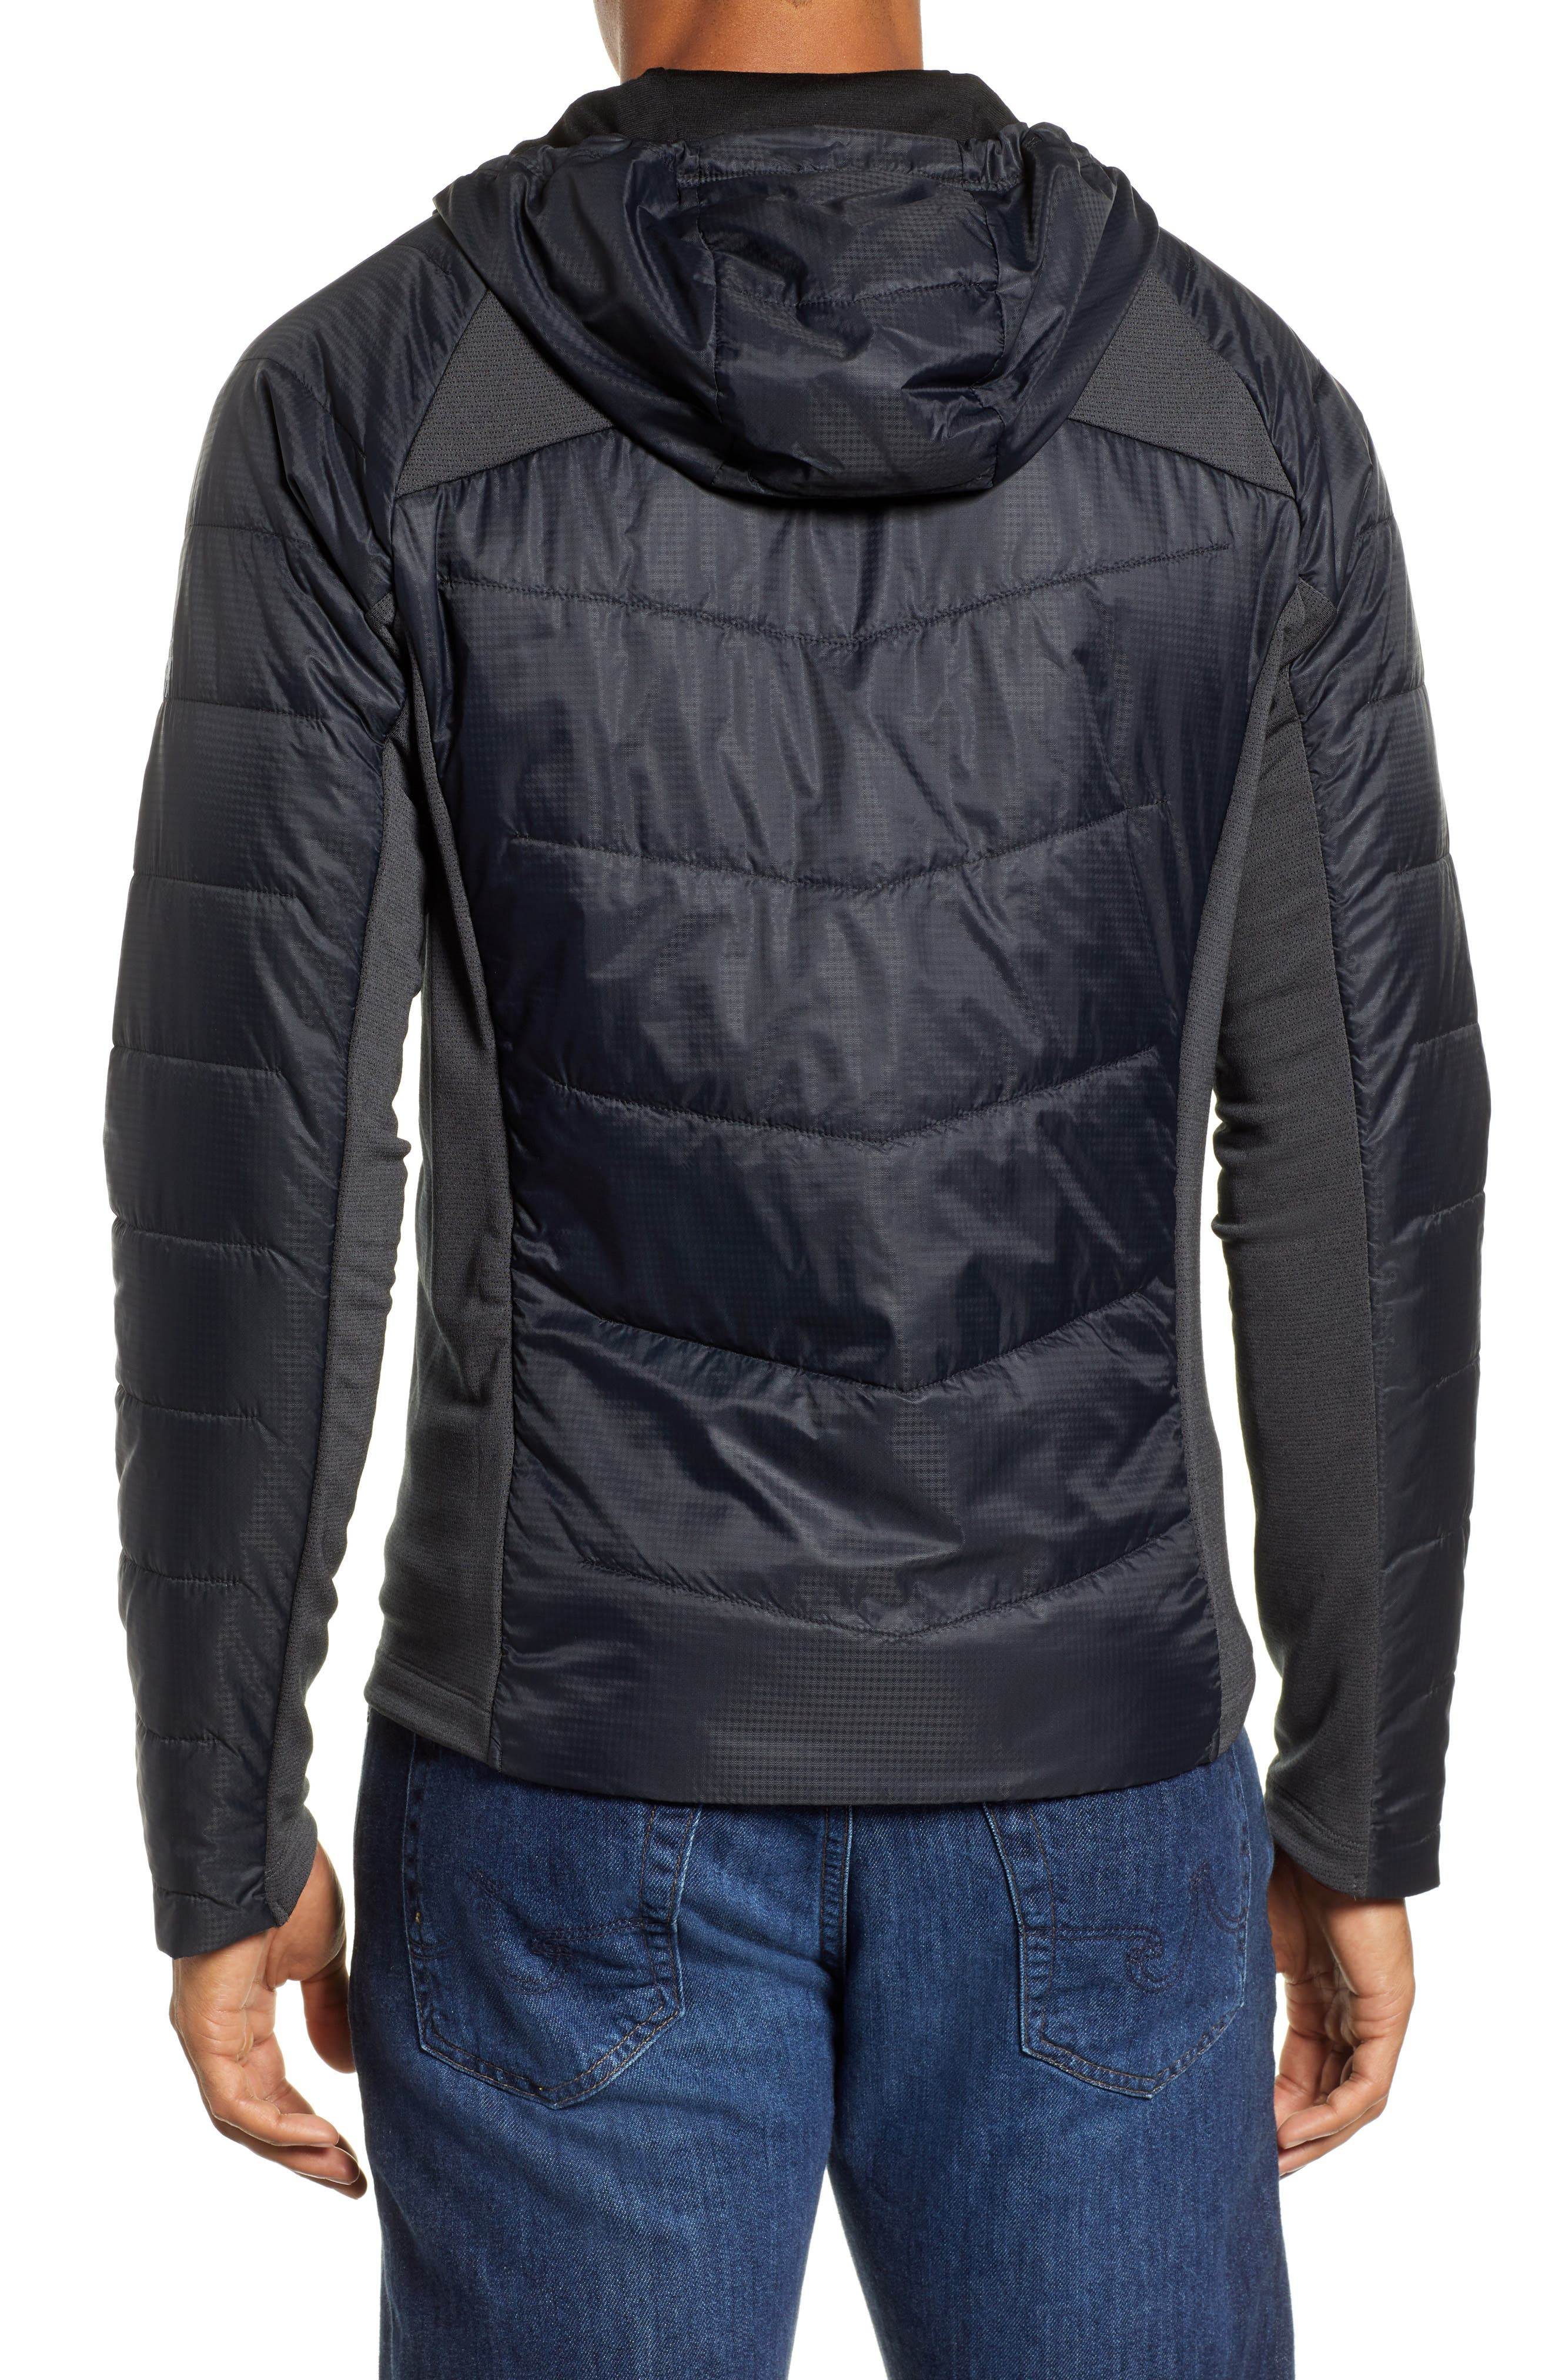 Smartloft 60 Hooded Jacket,                             Alternate thumbnail 2, color,                             BLACK